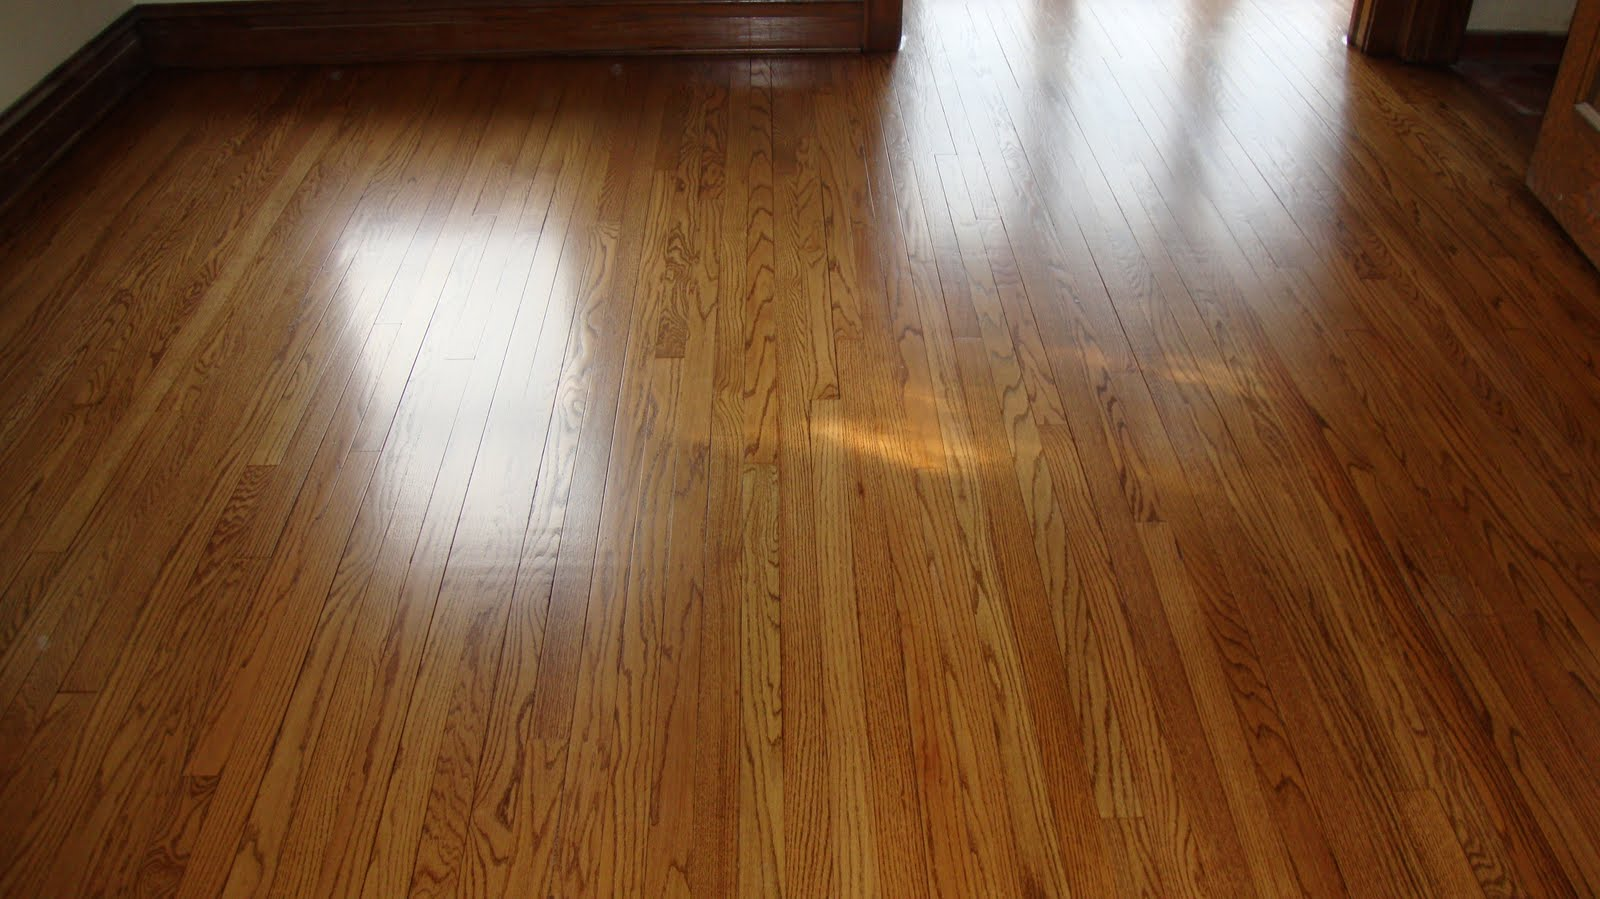 J k homestead re think re do rejoice for Hardwood floors too shiny